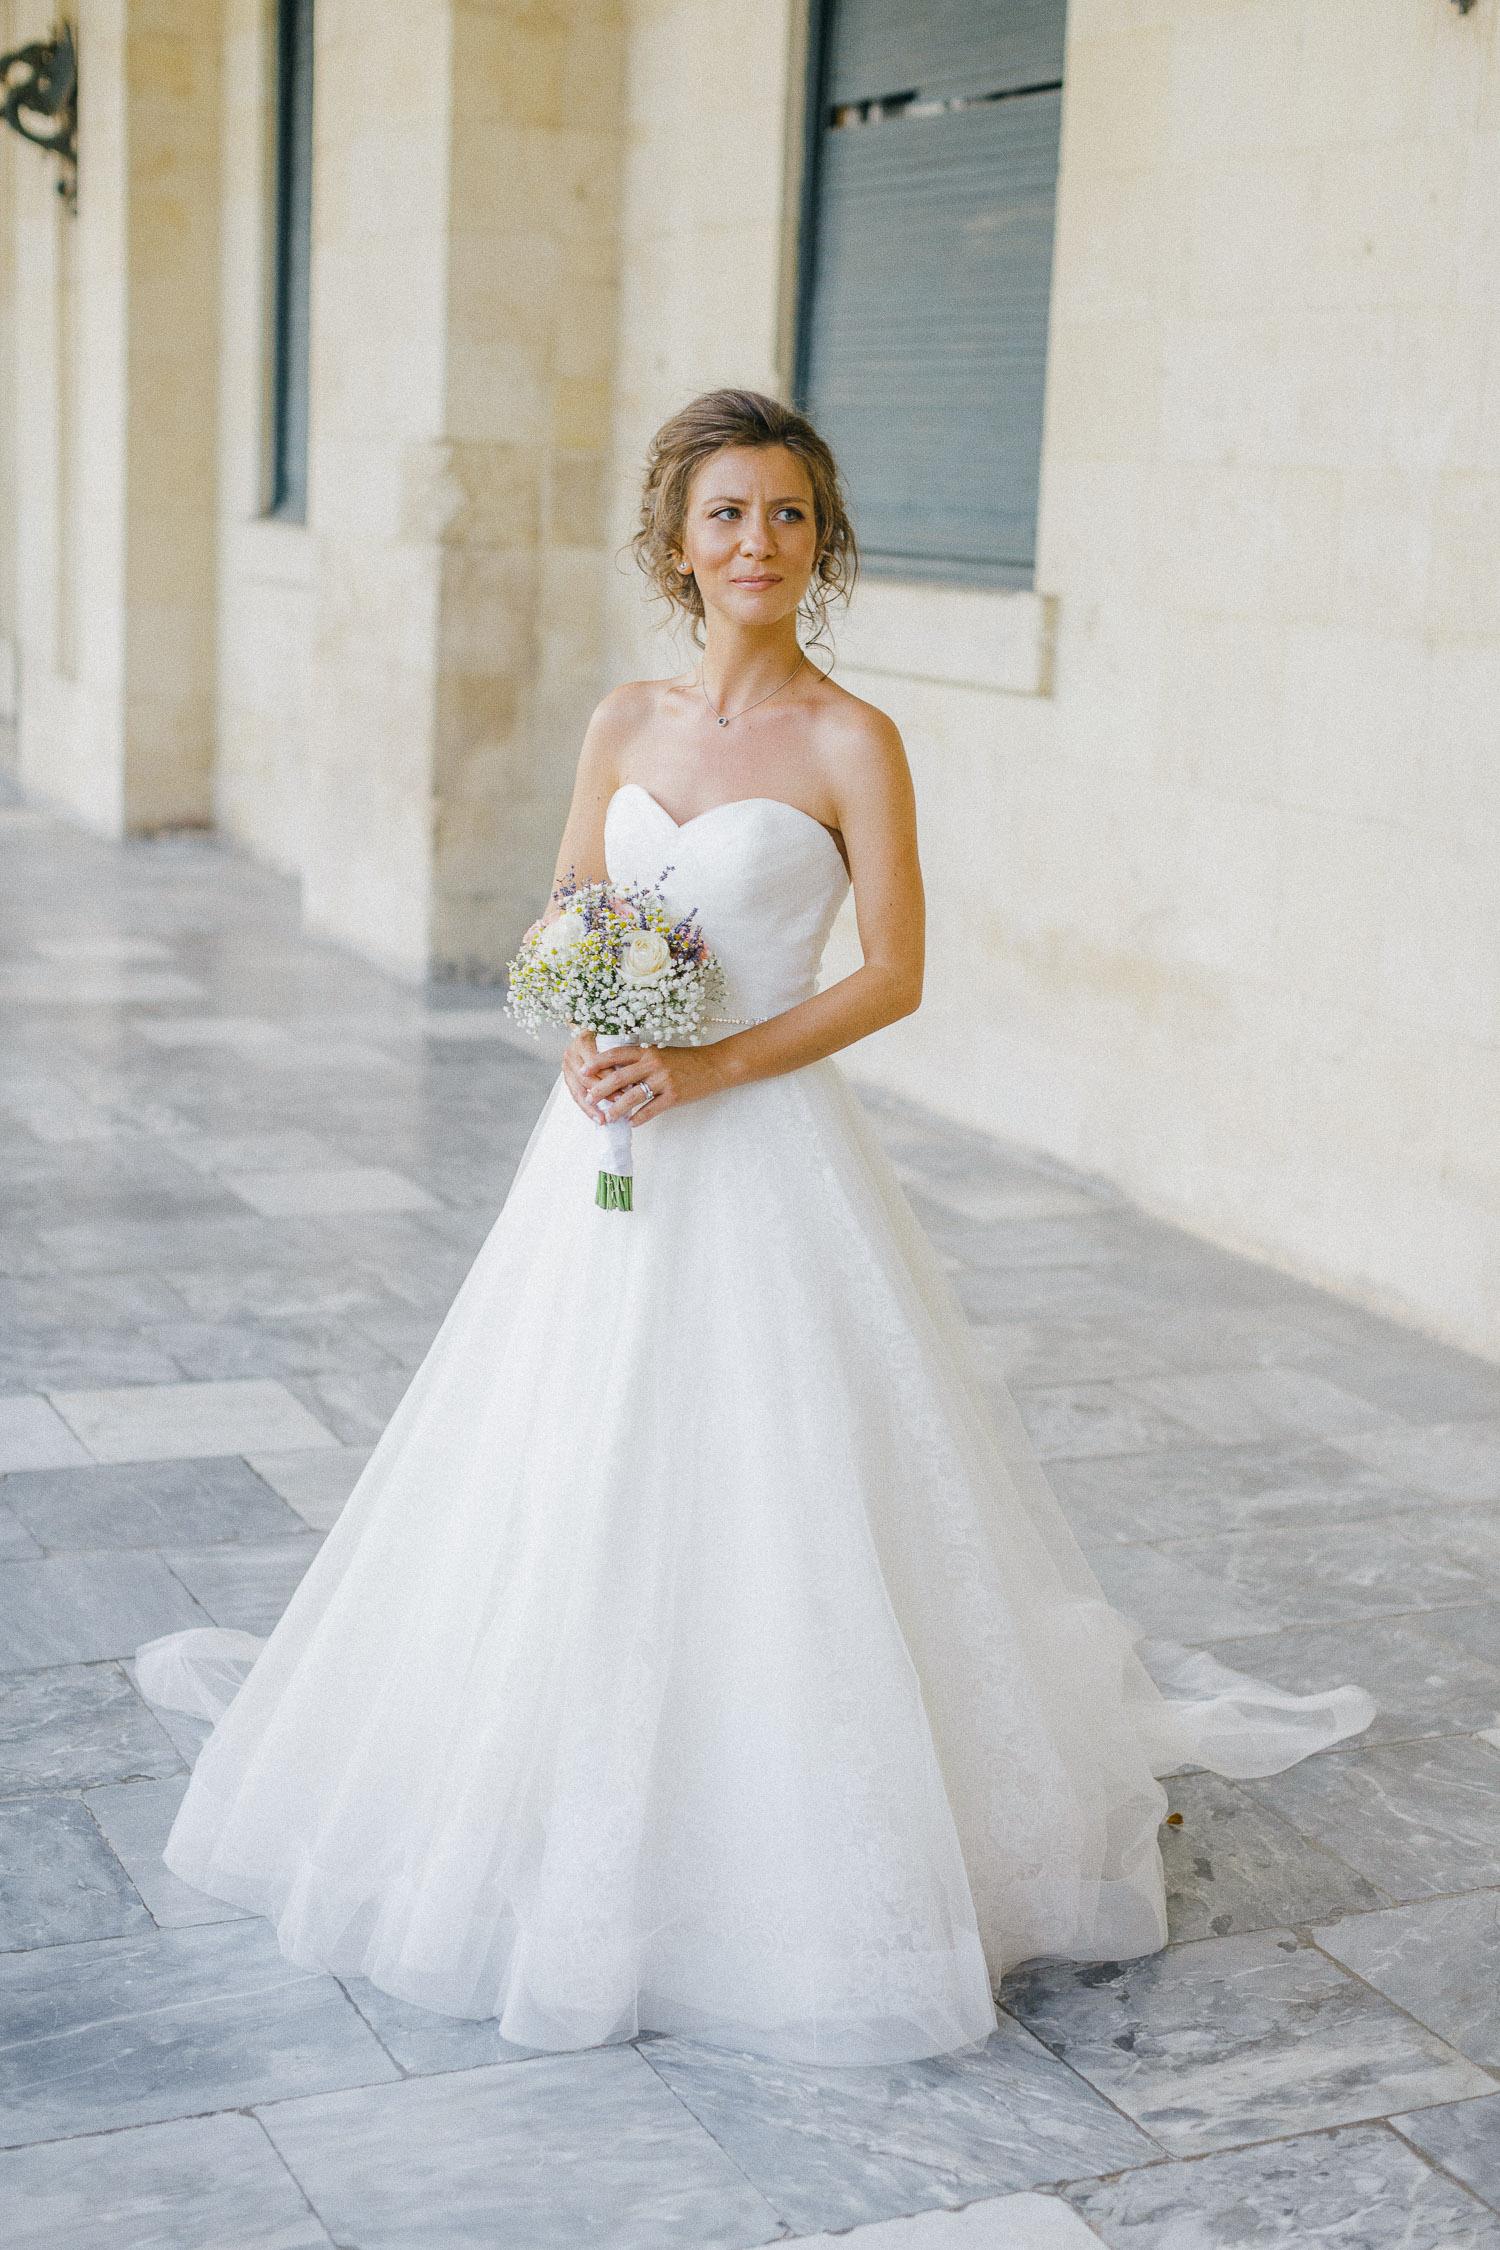 Timeless bridal portrait at Corfu St Michael Palace while an Old World micro wedding in Corfu Island